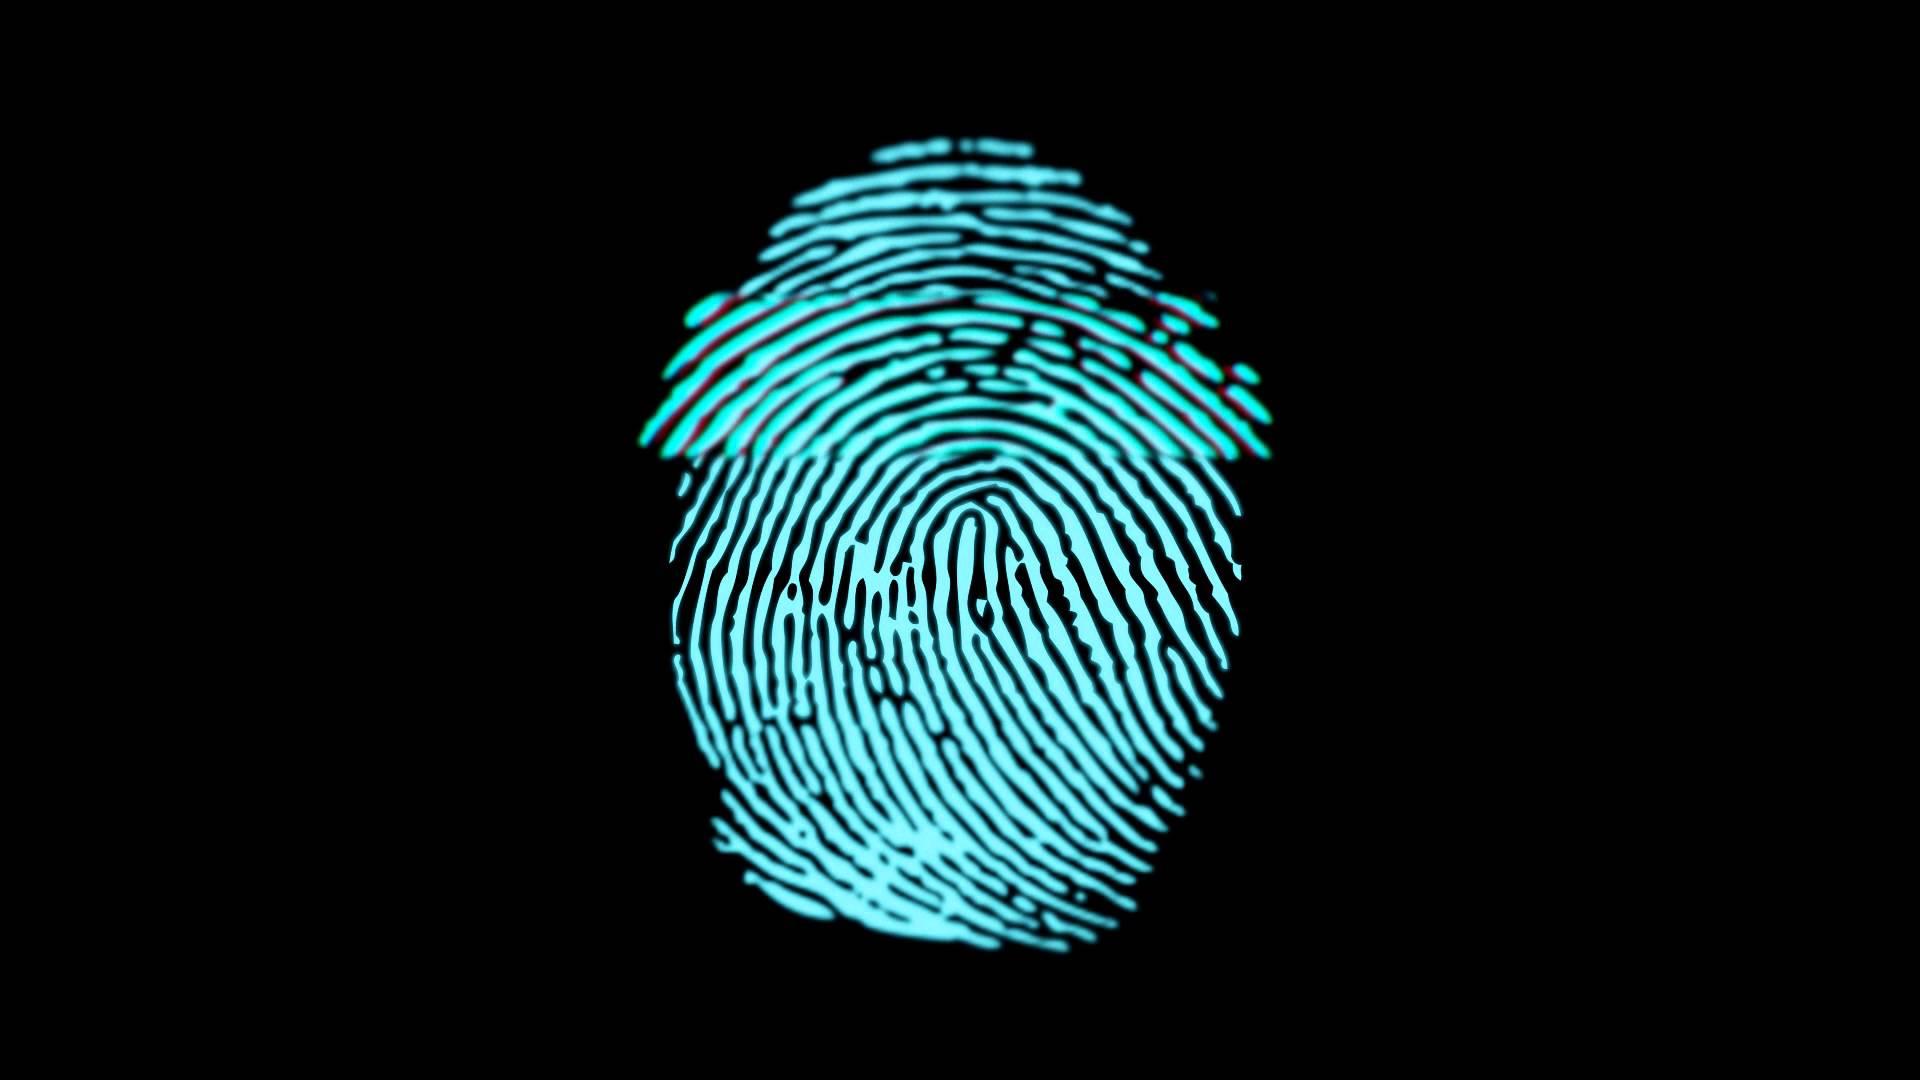 Fingerprint Scan - Animated Gif Fingerprint Gif , HD Wallpaper & Backgrounds